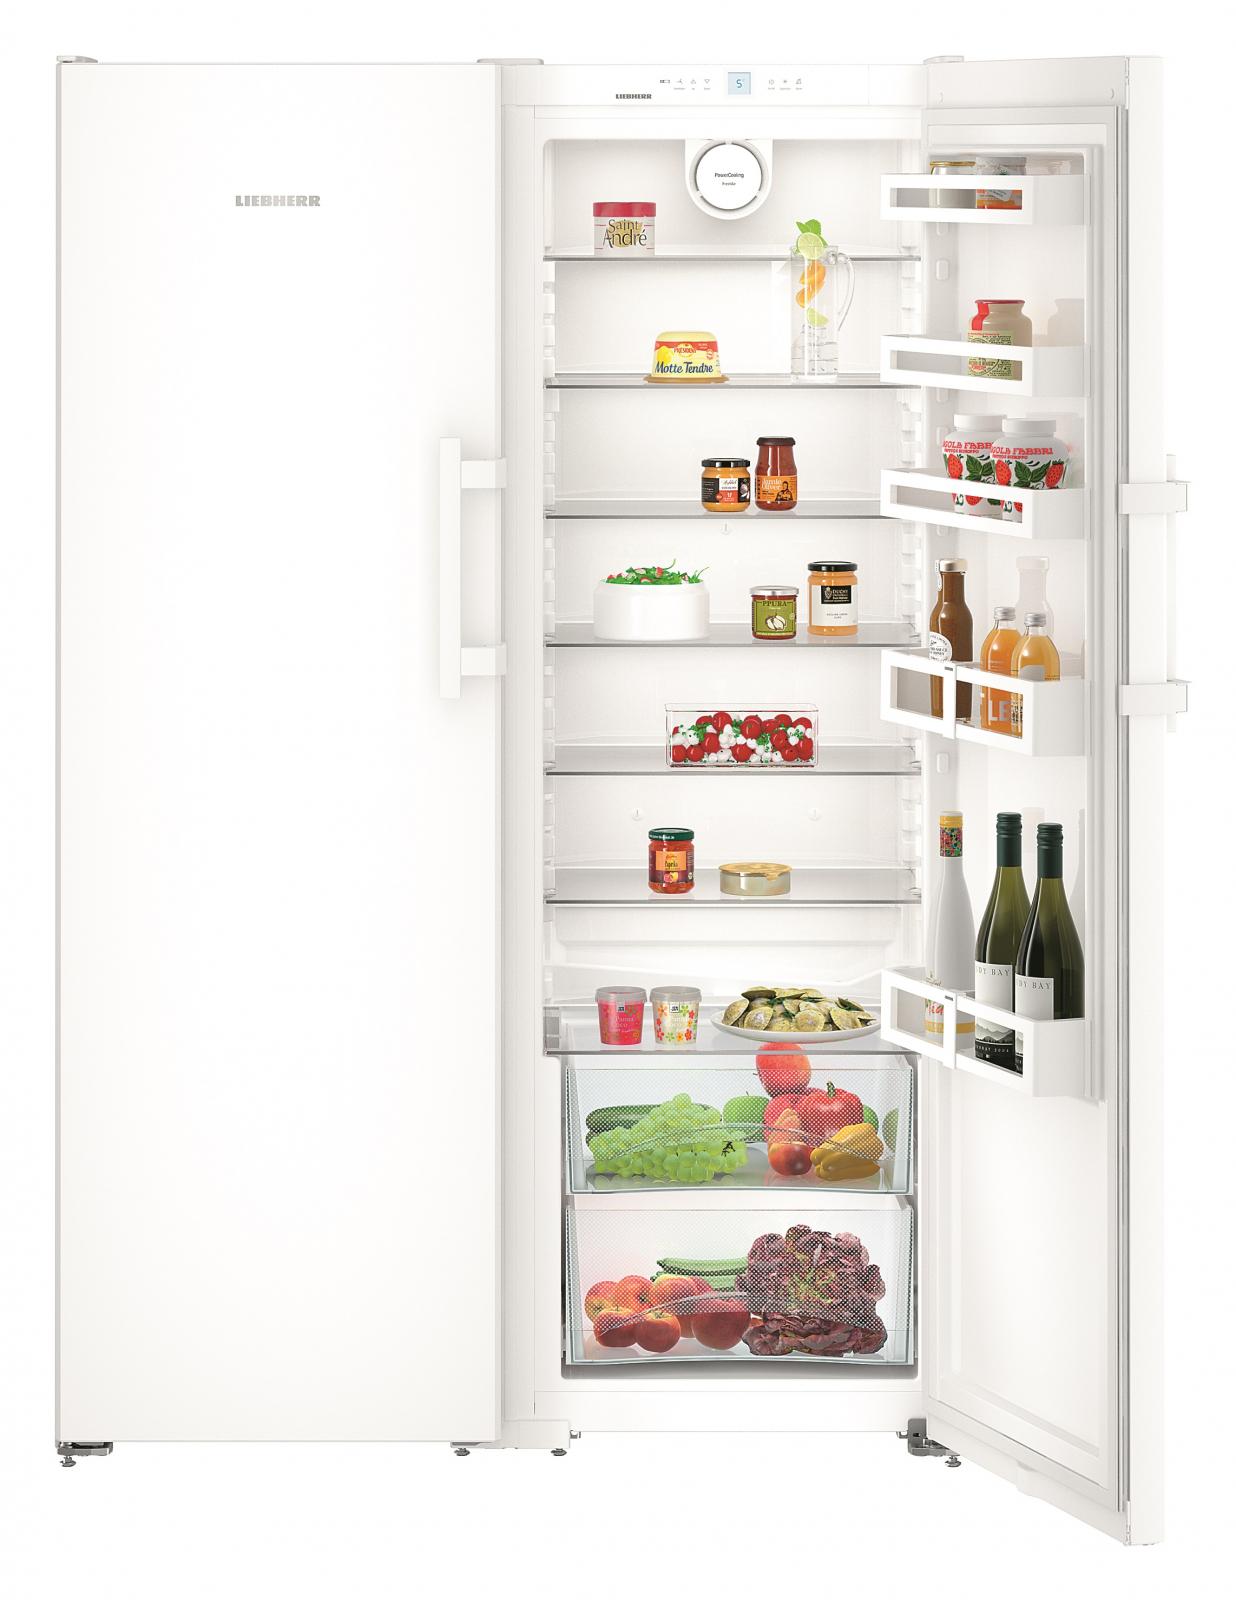 купить Side-by-side холодильник Liebherr SBS 7242 Украина фото 7